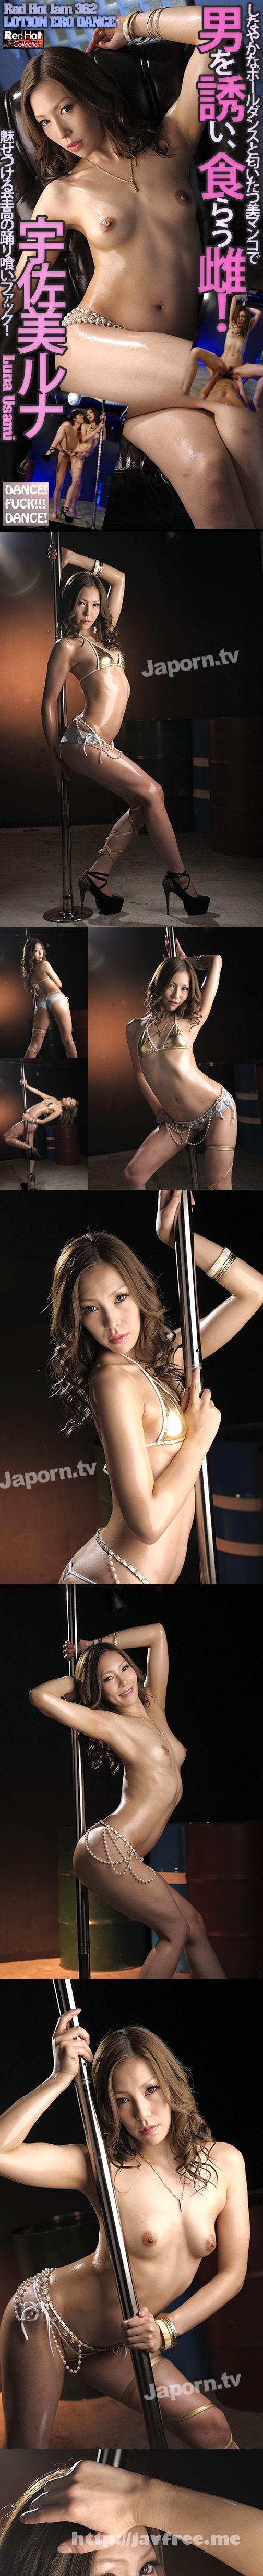 [RHJ 362] レッドホットジャム Vol.362 Lotion Ero Dance : 宇佐美ルナ 宇佐美ルナ Runa Usami RHJ